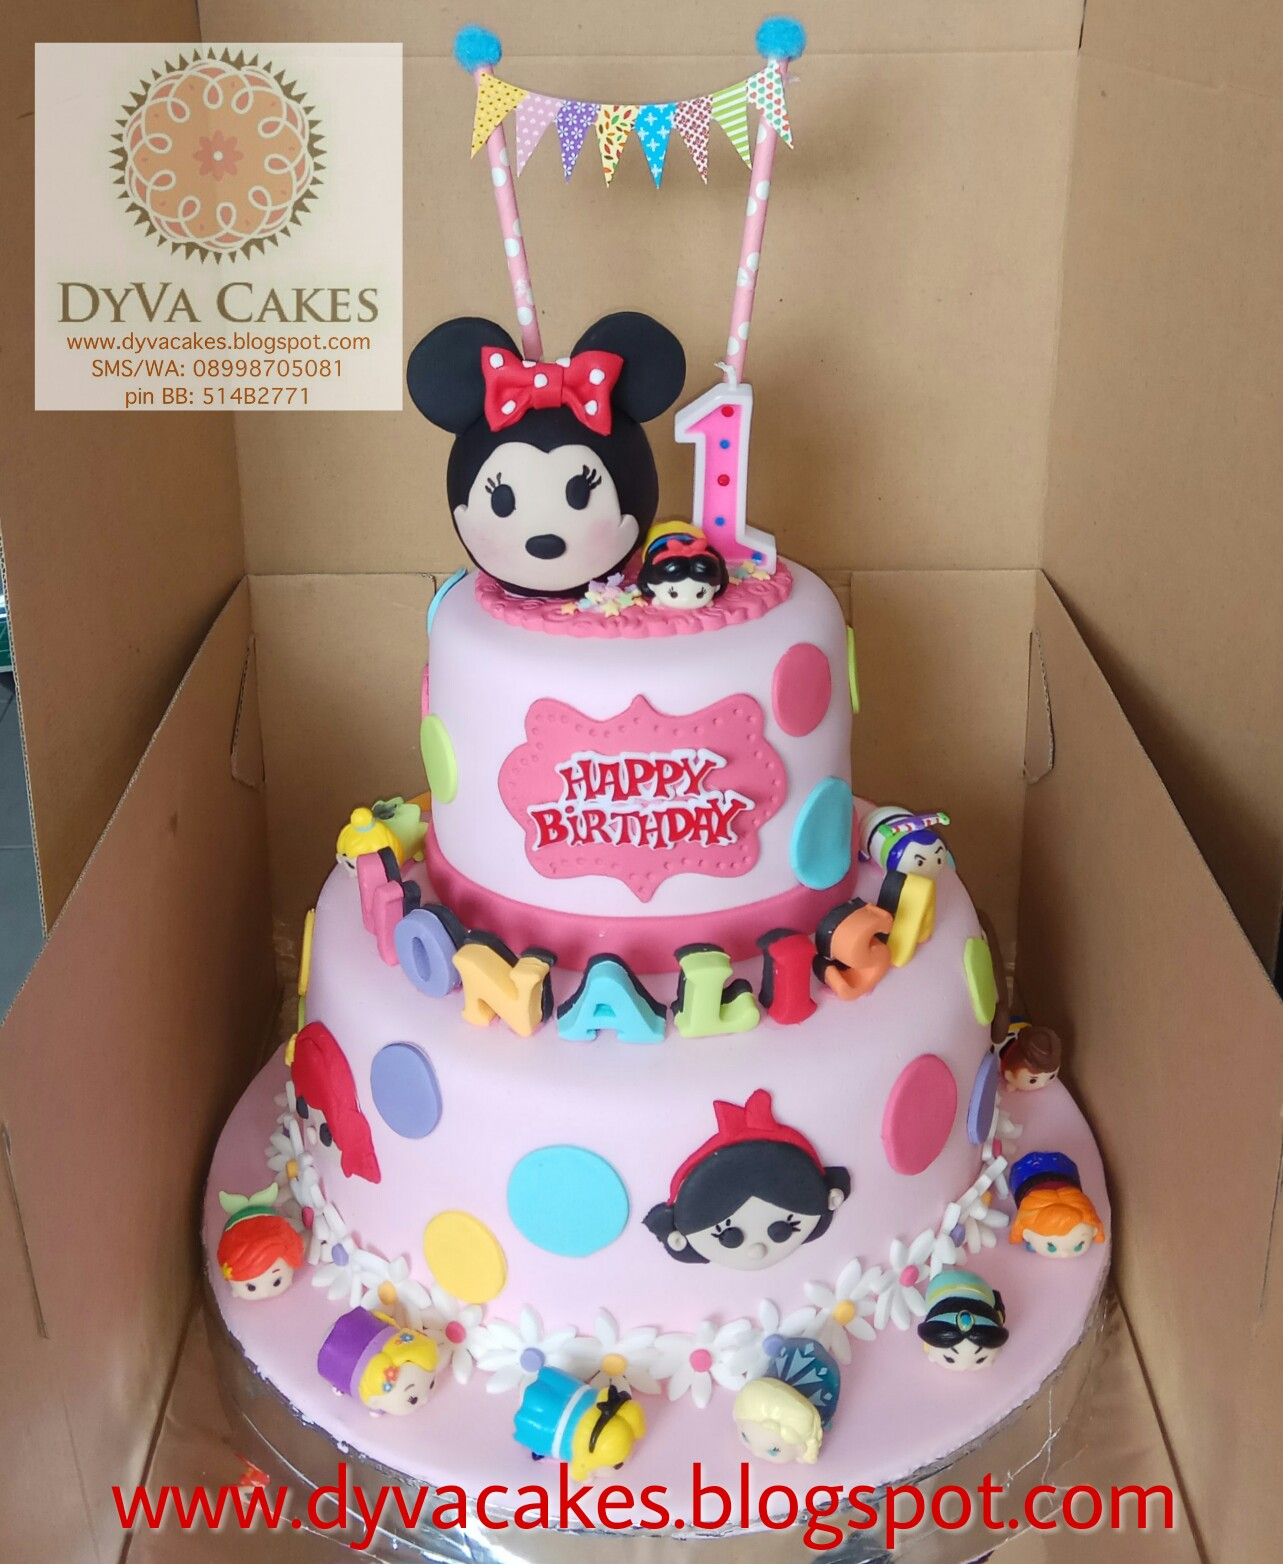 DyVa Cakes Pink Tsum Tsum Birthday Cake